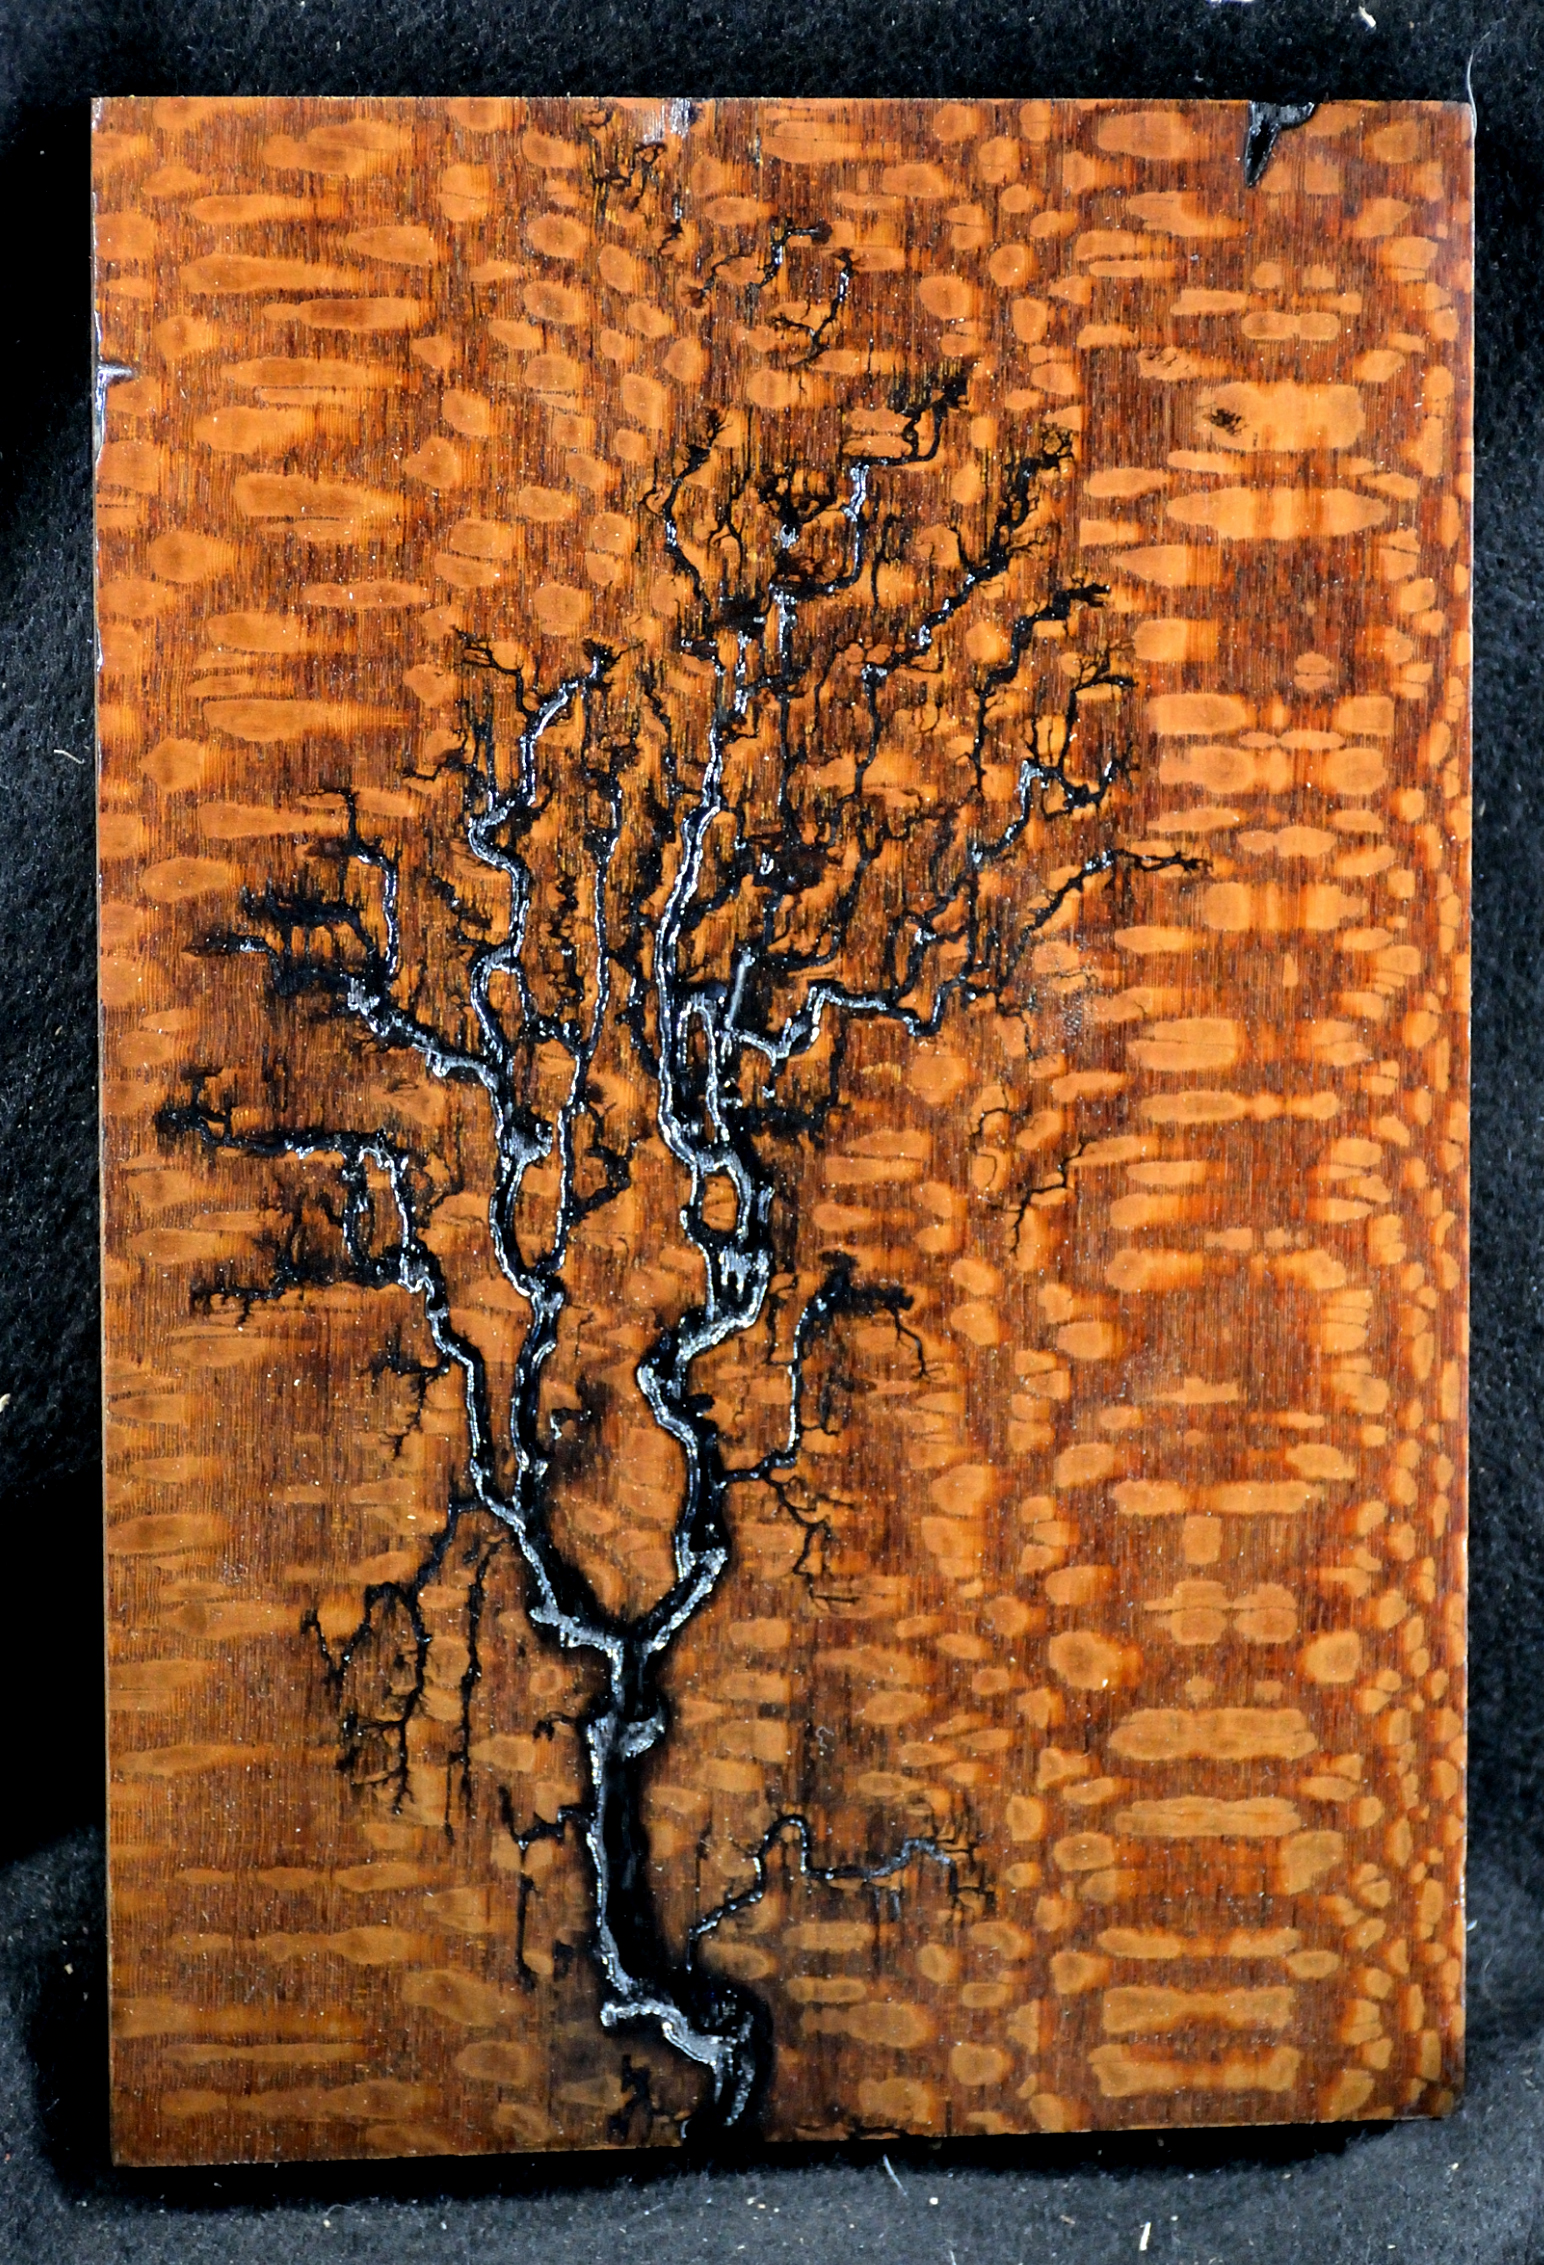 Leopardwood fractals